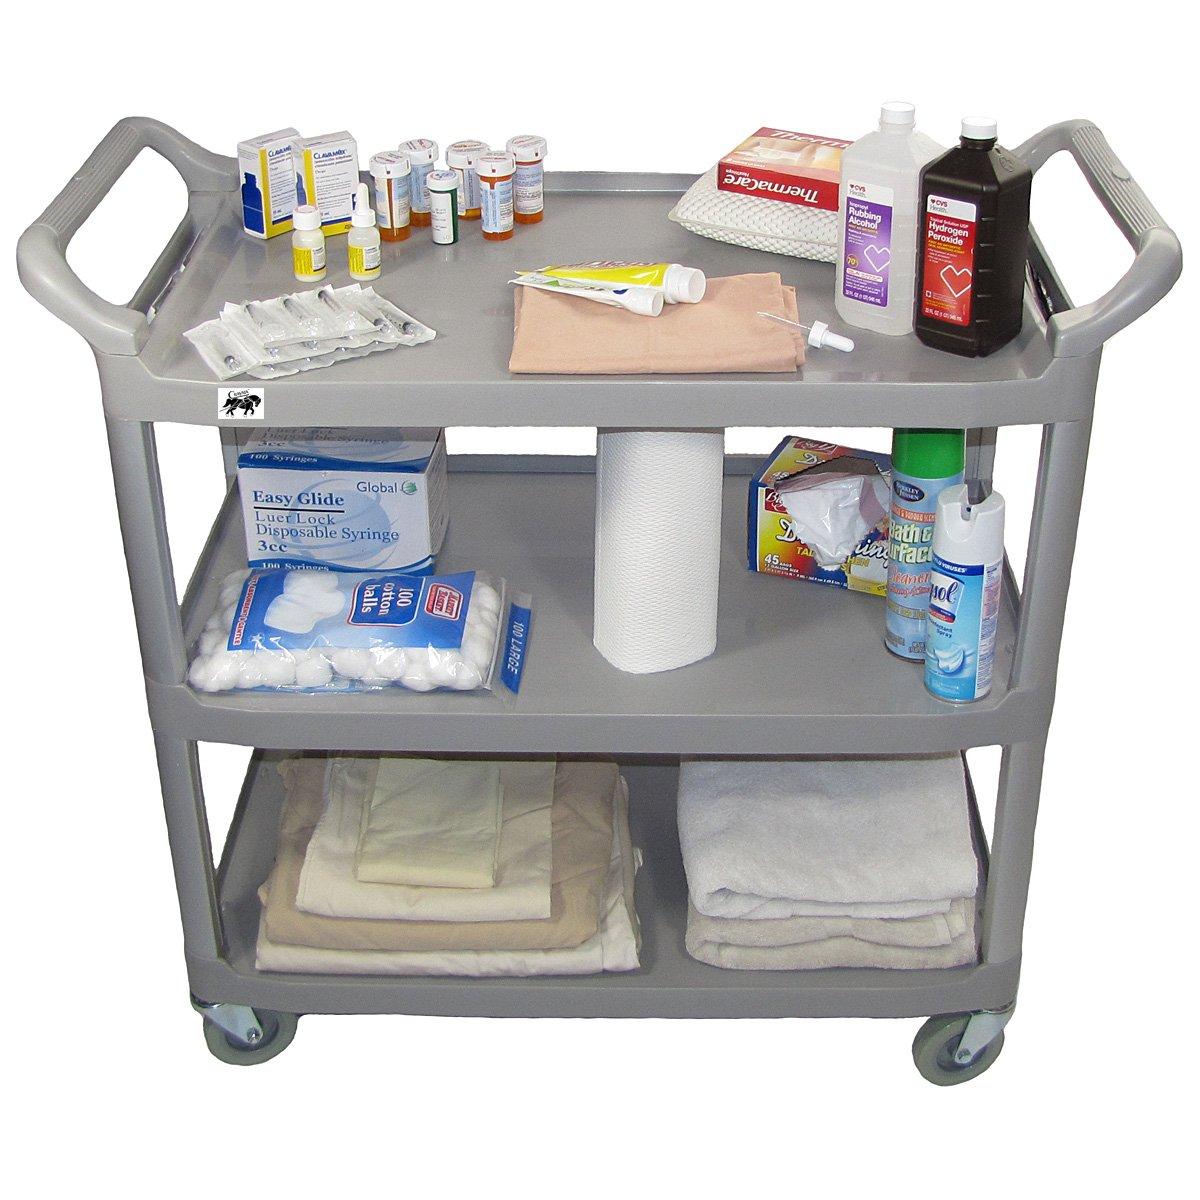 Crayata Hospital Comfort Cart, 3 Shelf Hospitality, Medical and Service Utility Cart, Large Gray